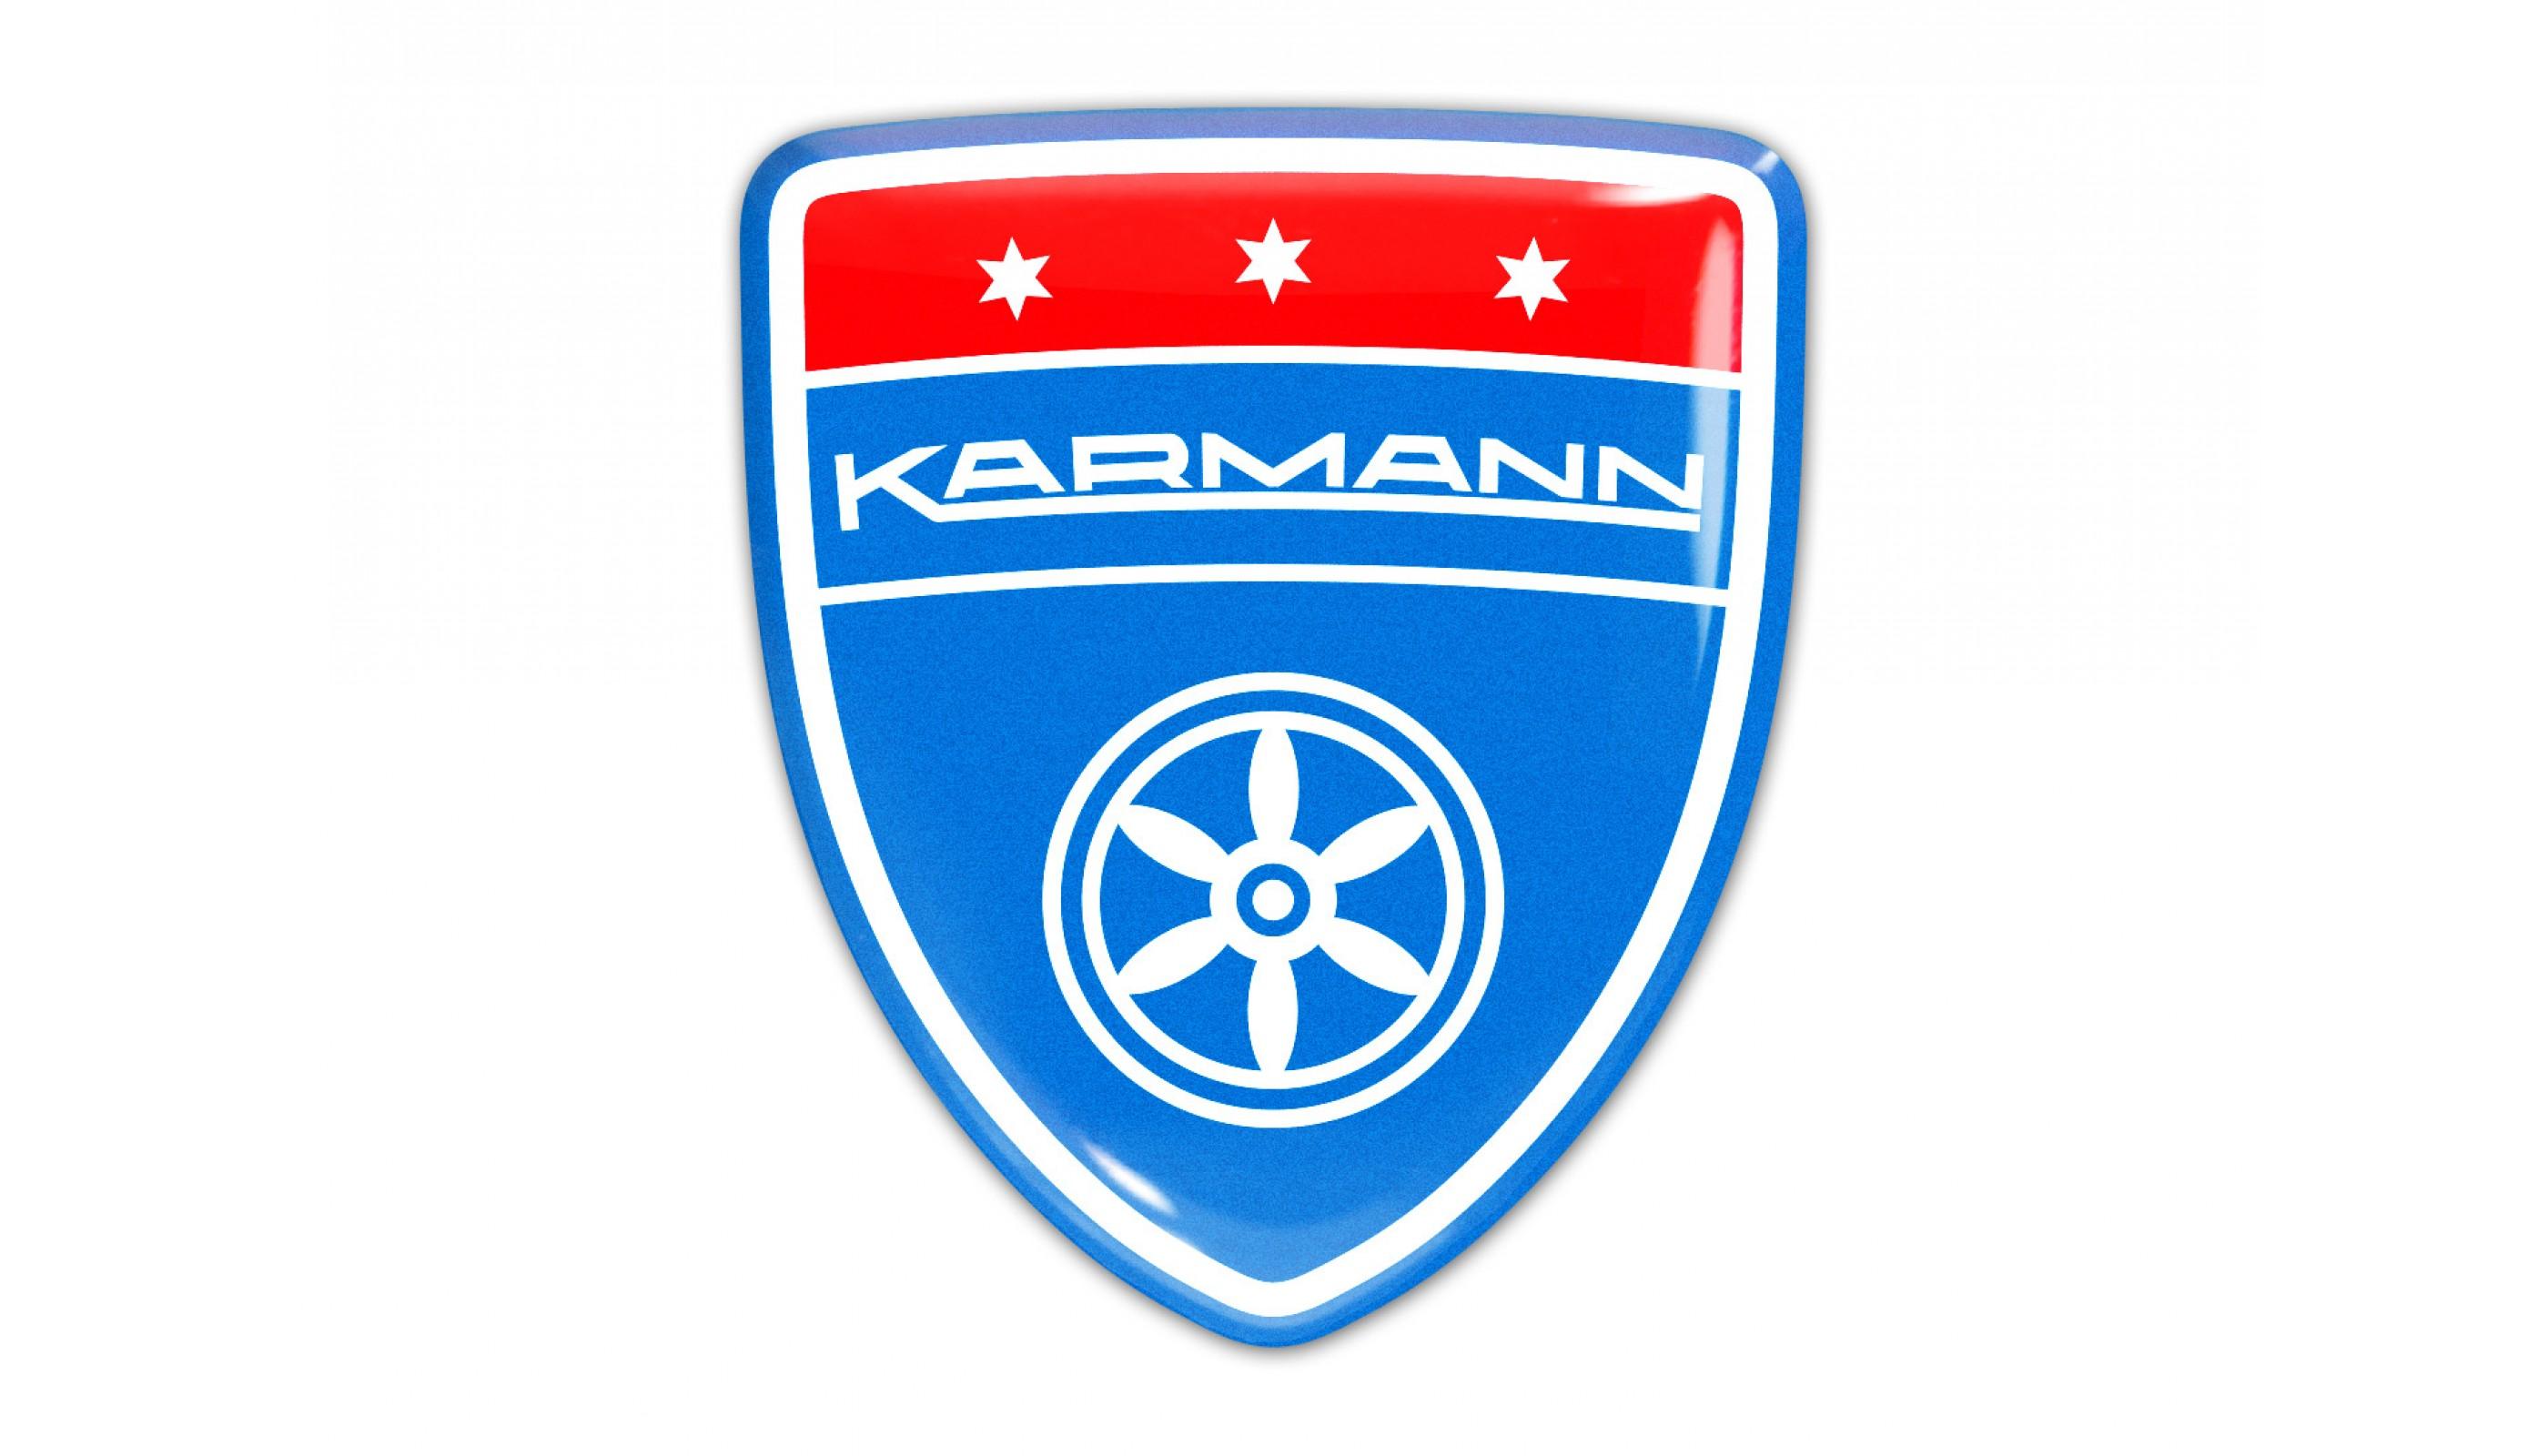 Karmann Blue Domed Emblem